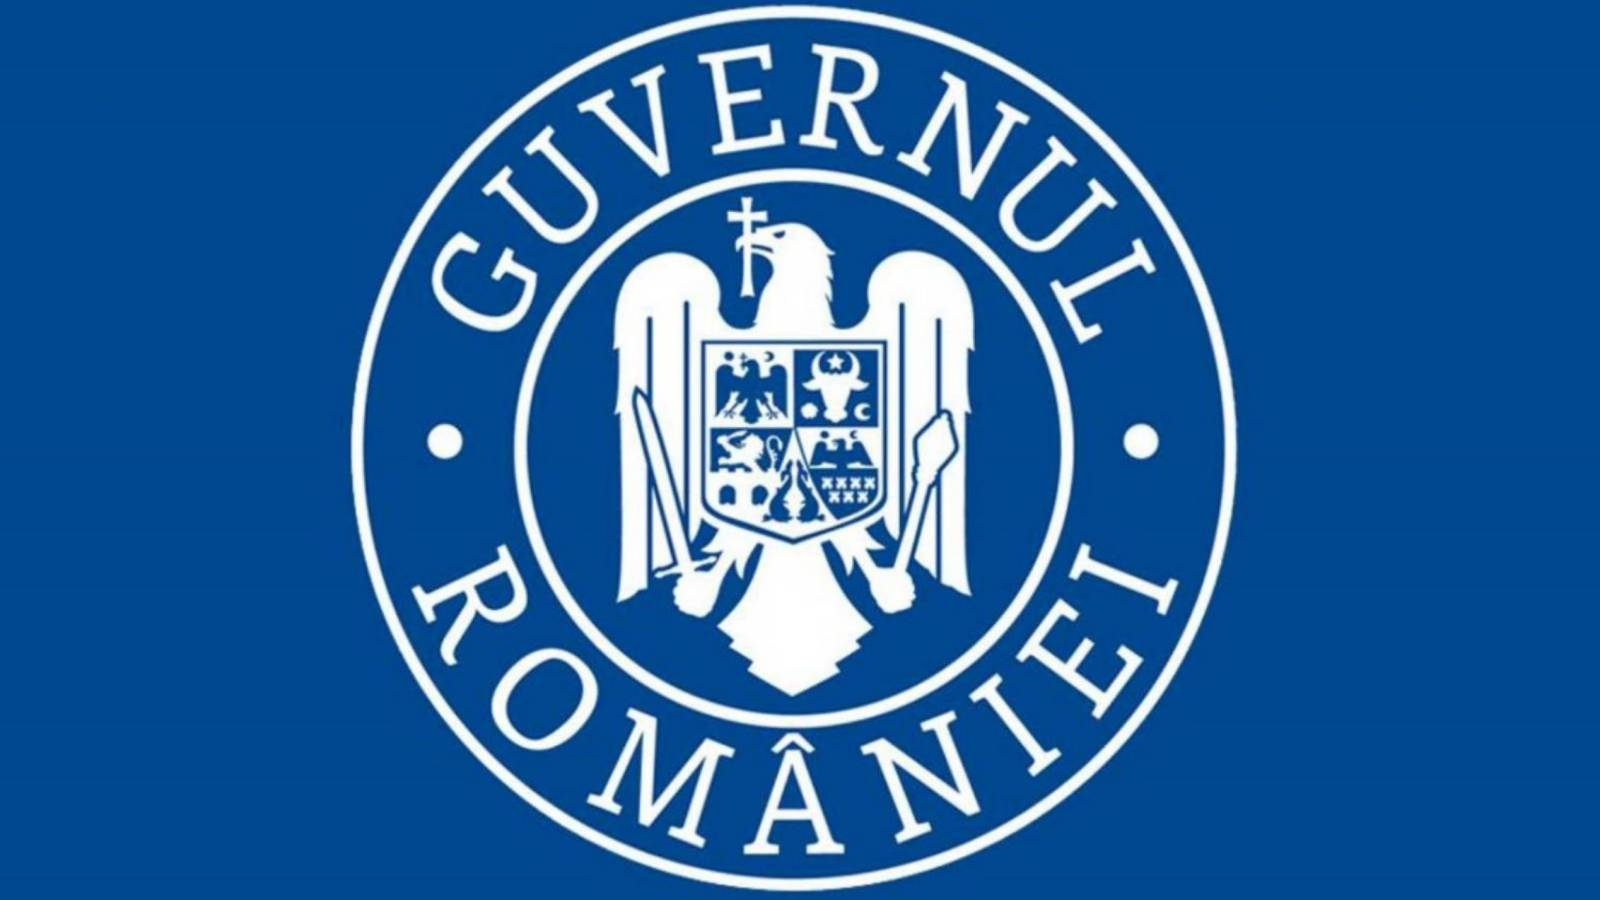 Guvernul Romaniei restirctii martie 2021